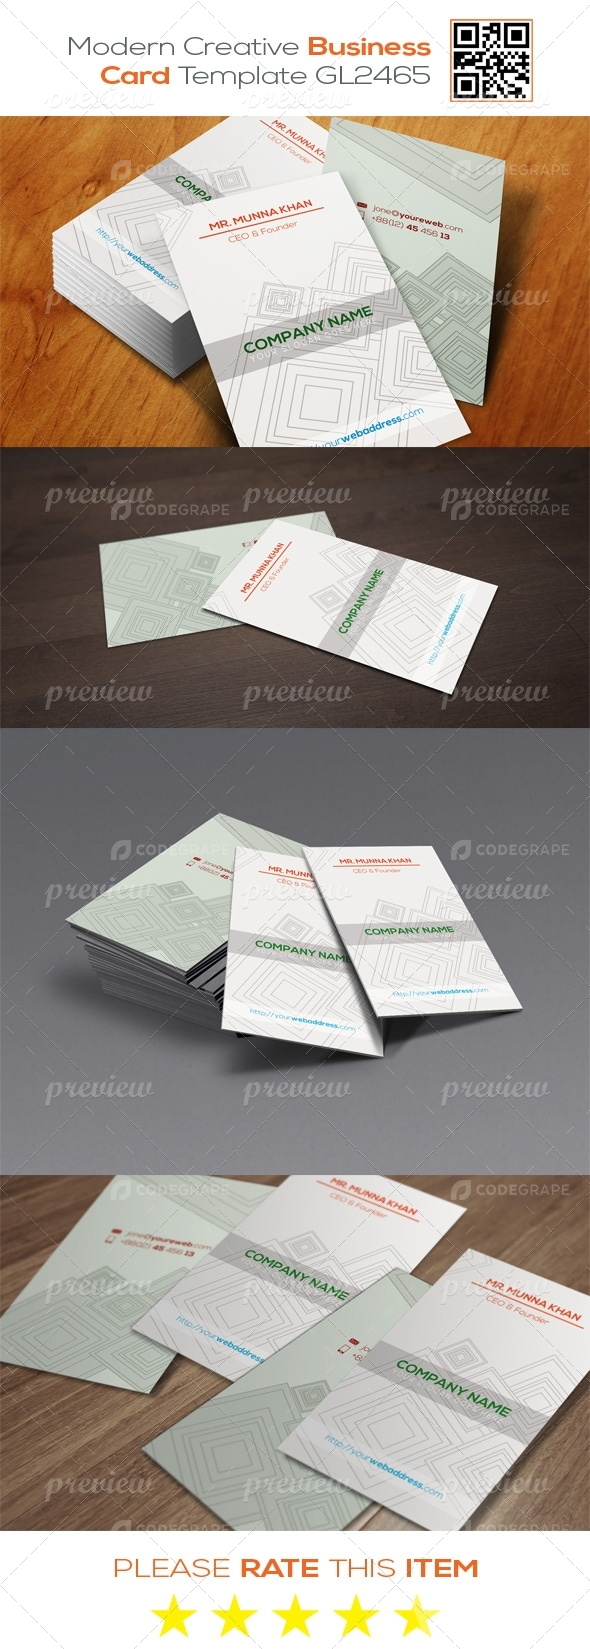 Modern Creative Business Card Template GL2465